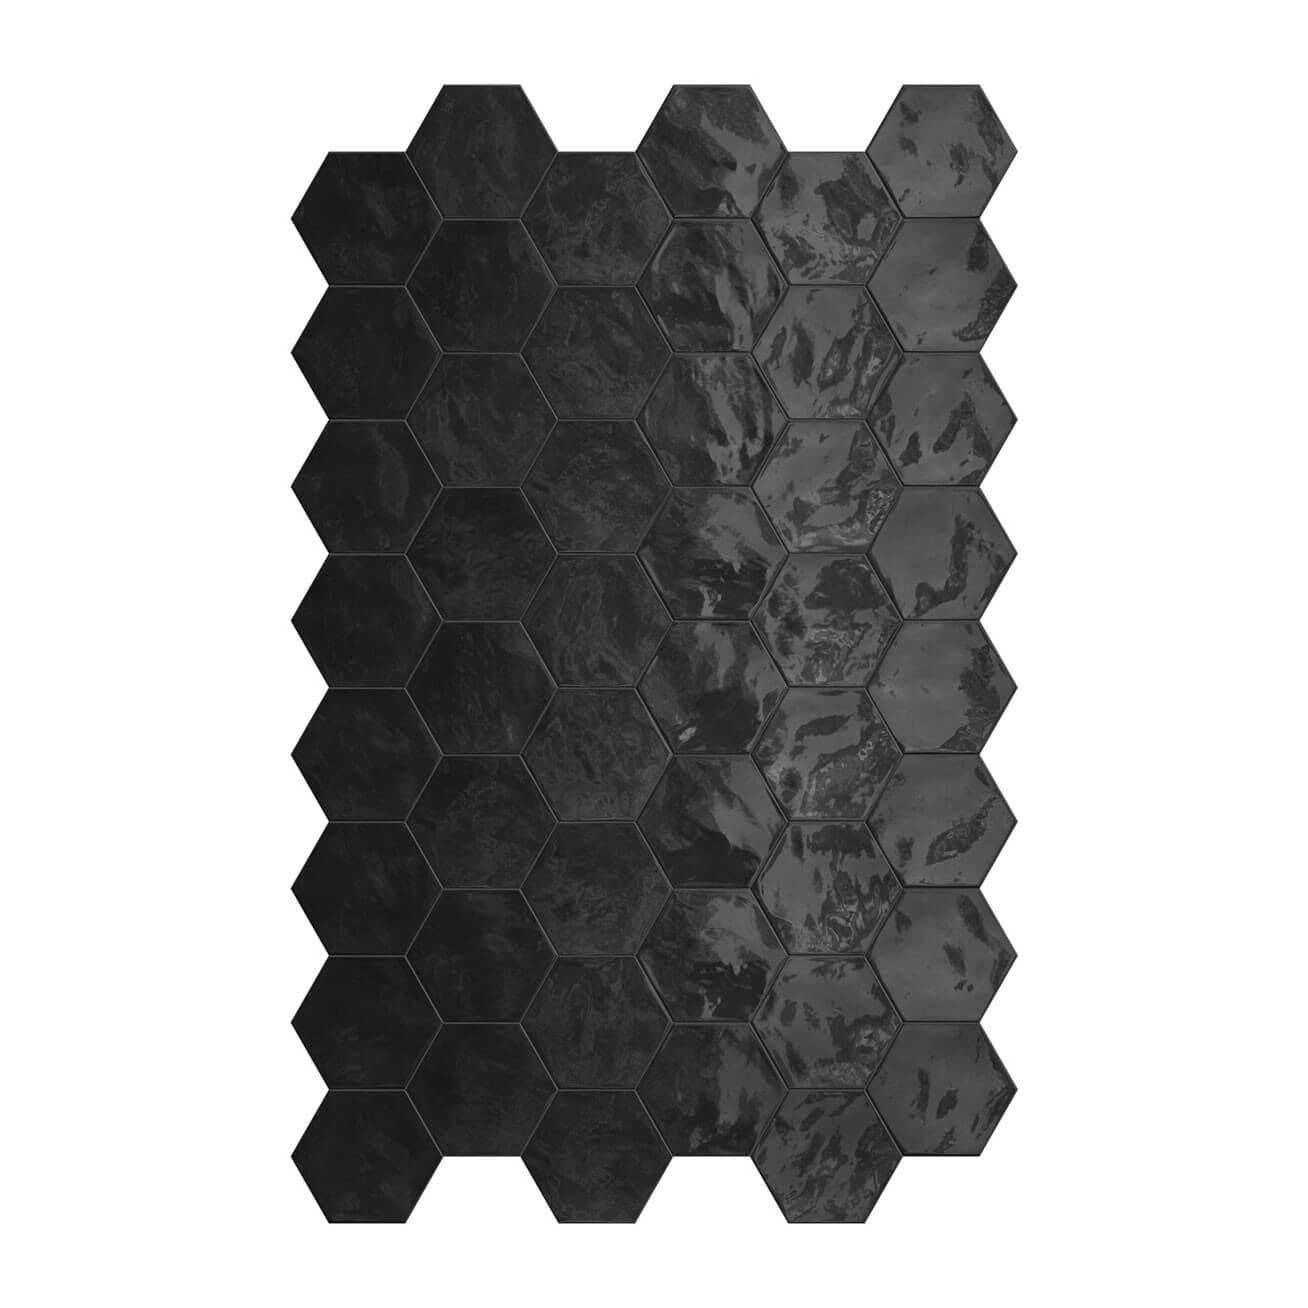 Carrelage hexagonal mur Hexa Wall Black